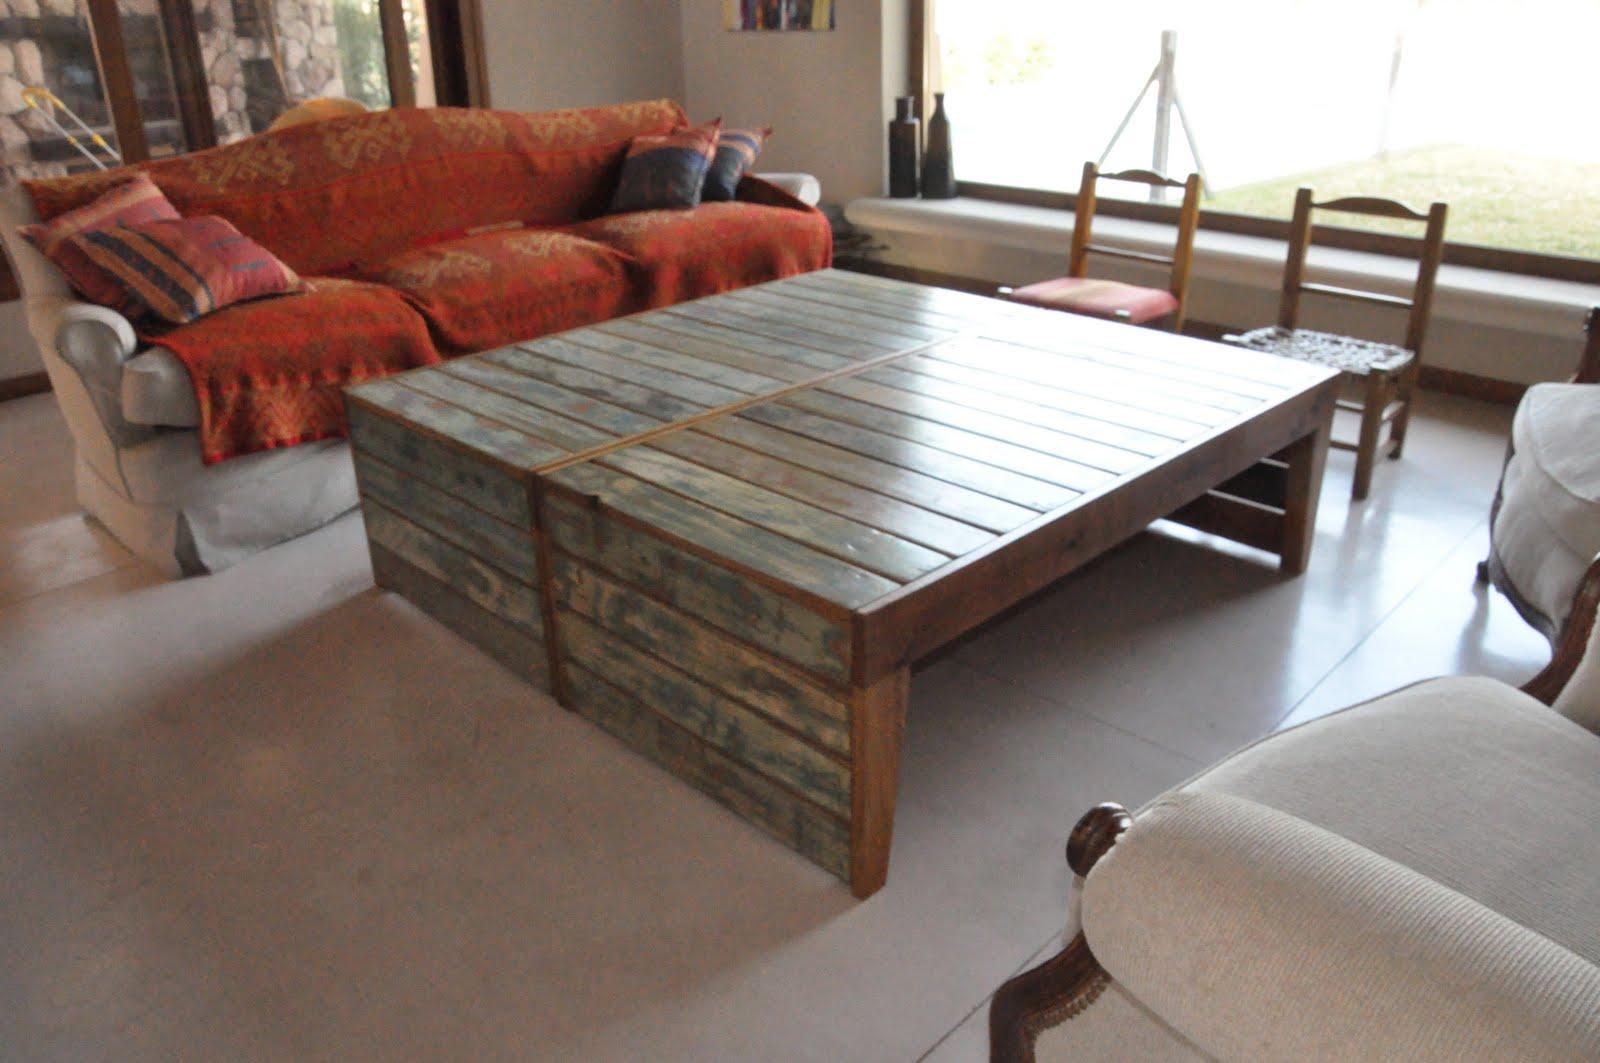 Muebles Cemento Top With Muebles Cemento Finest Las Calles  # Muebles Podesta